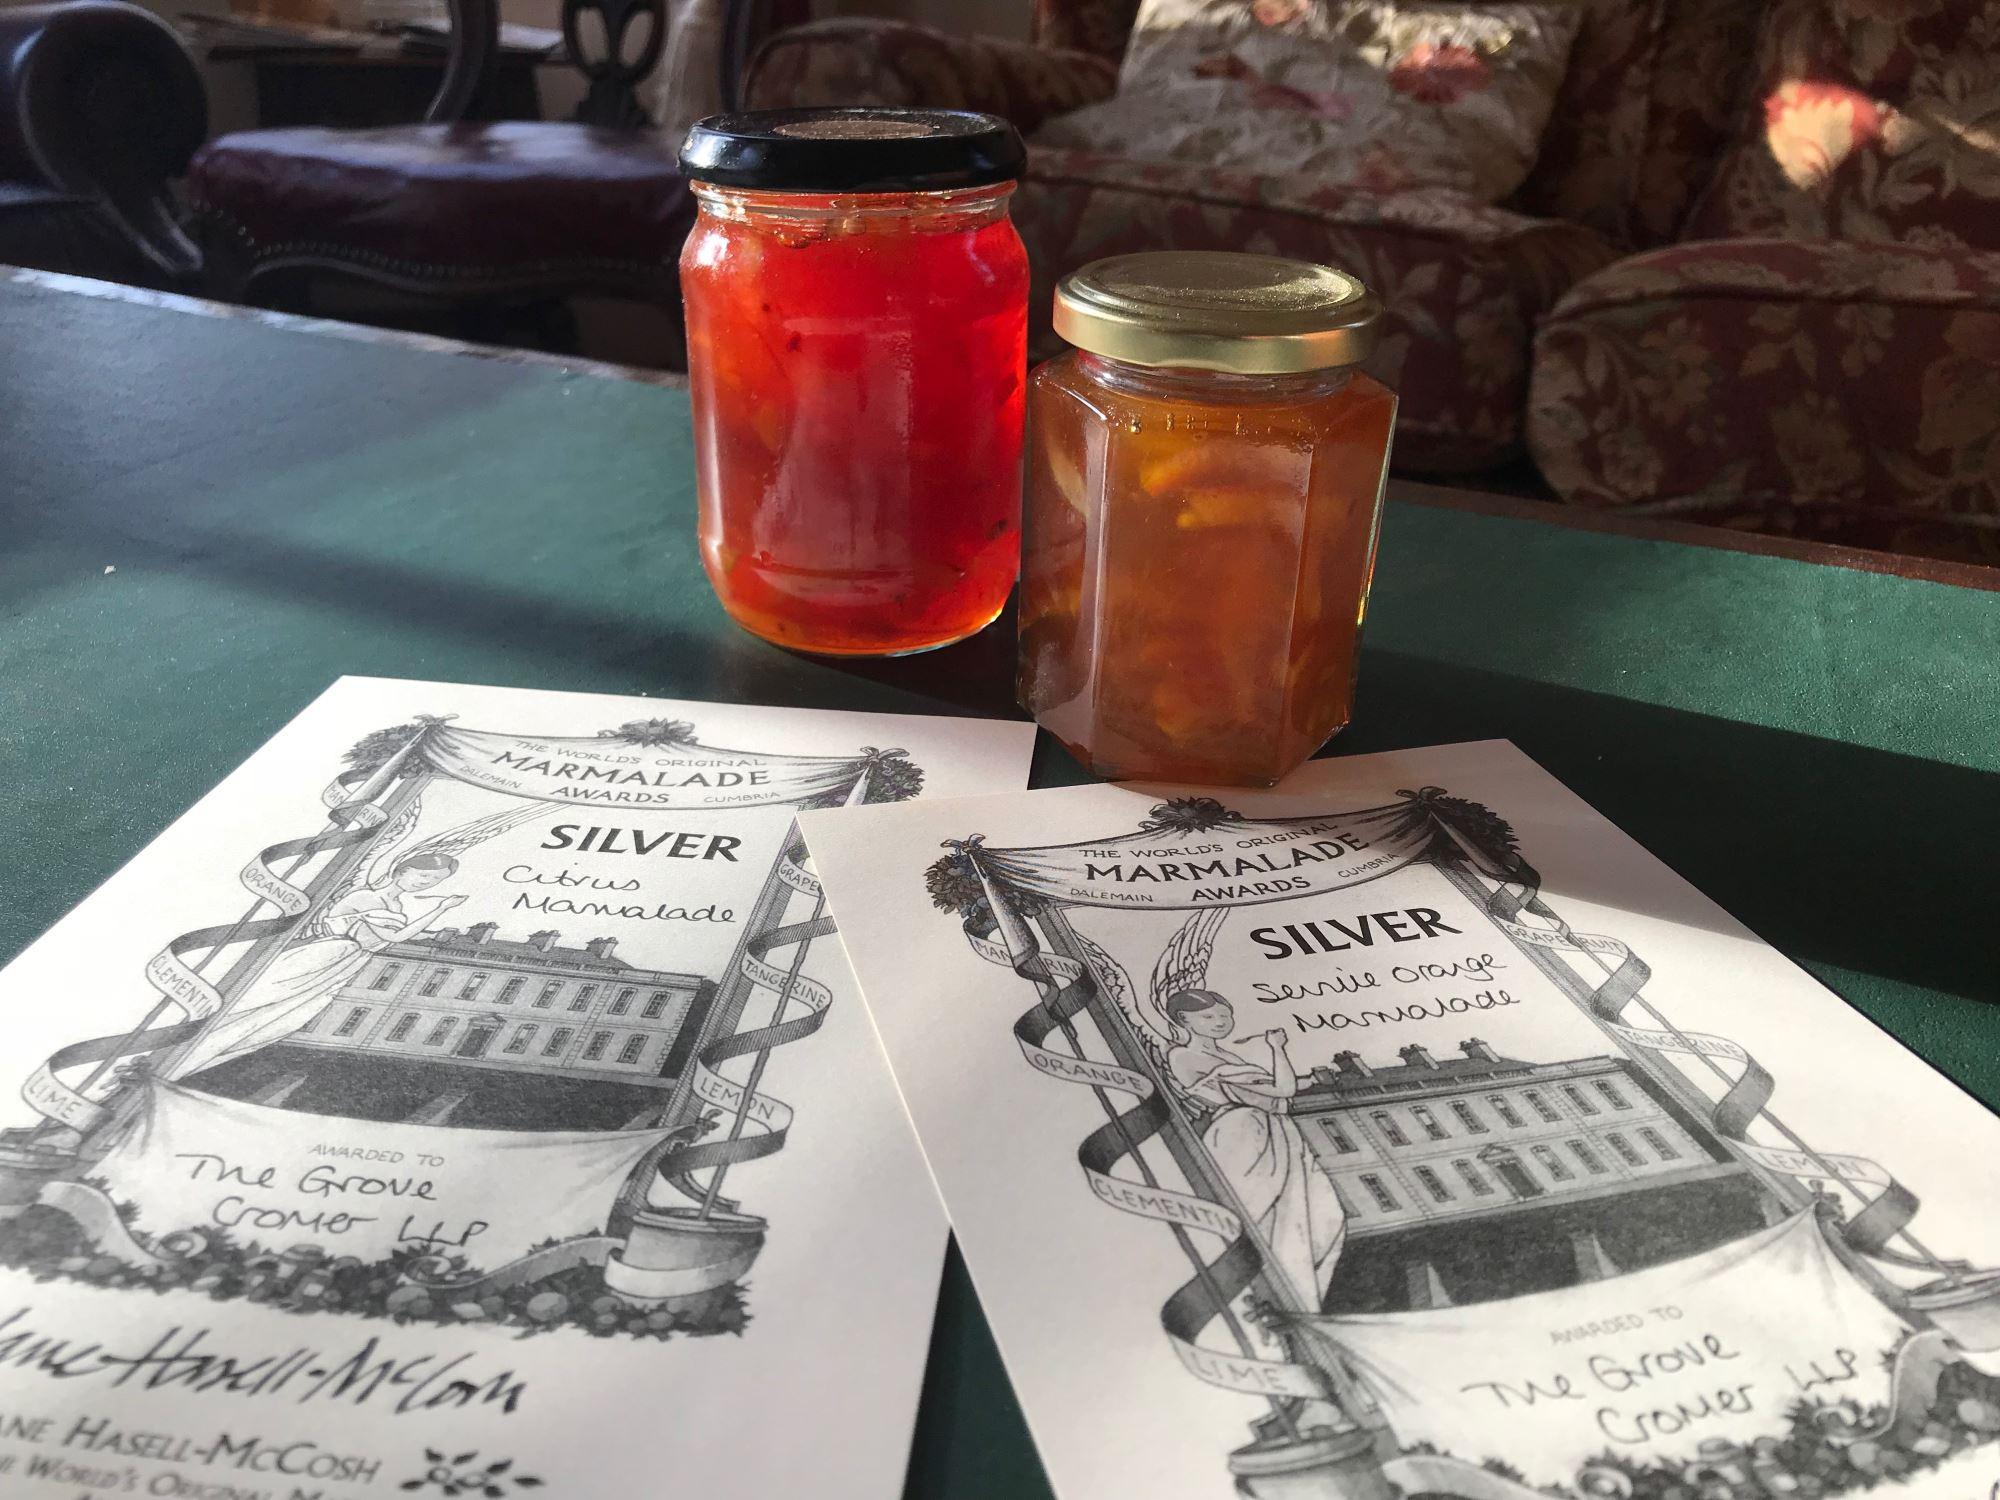 Marmalade The Grove Cromer